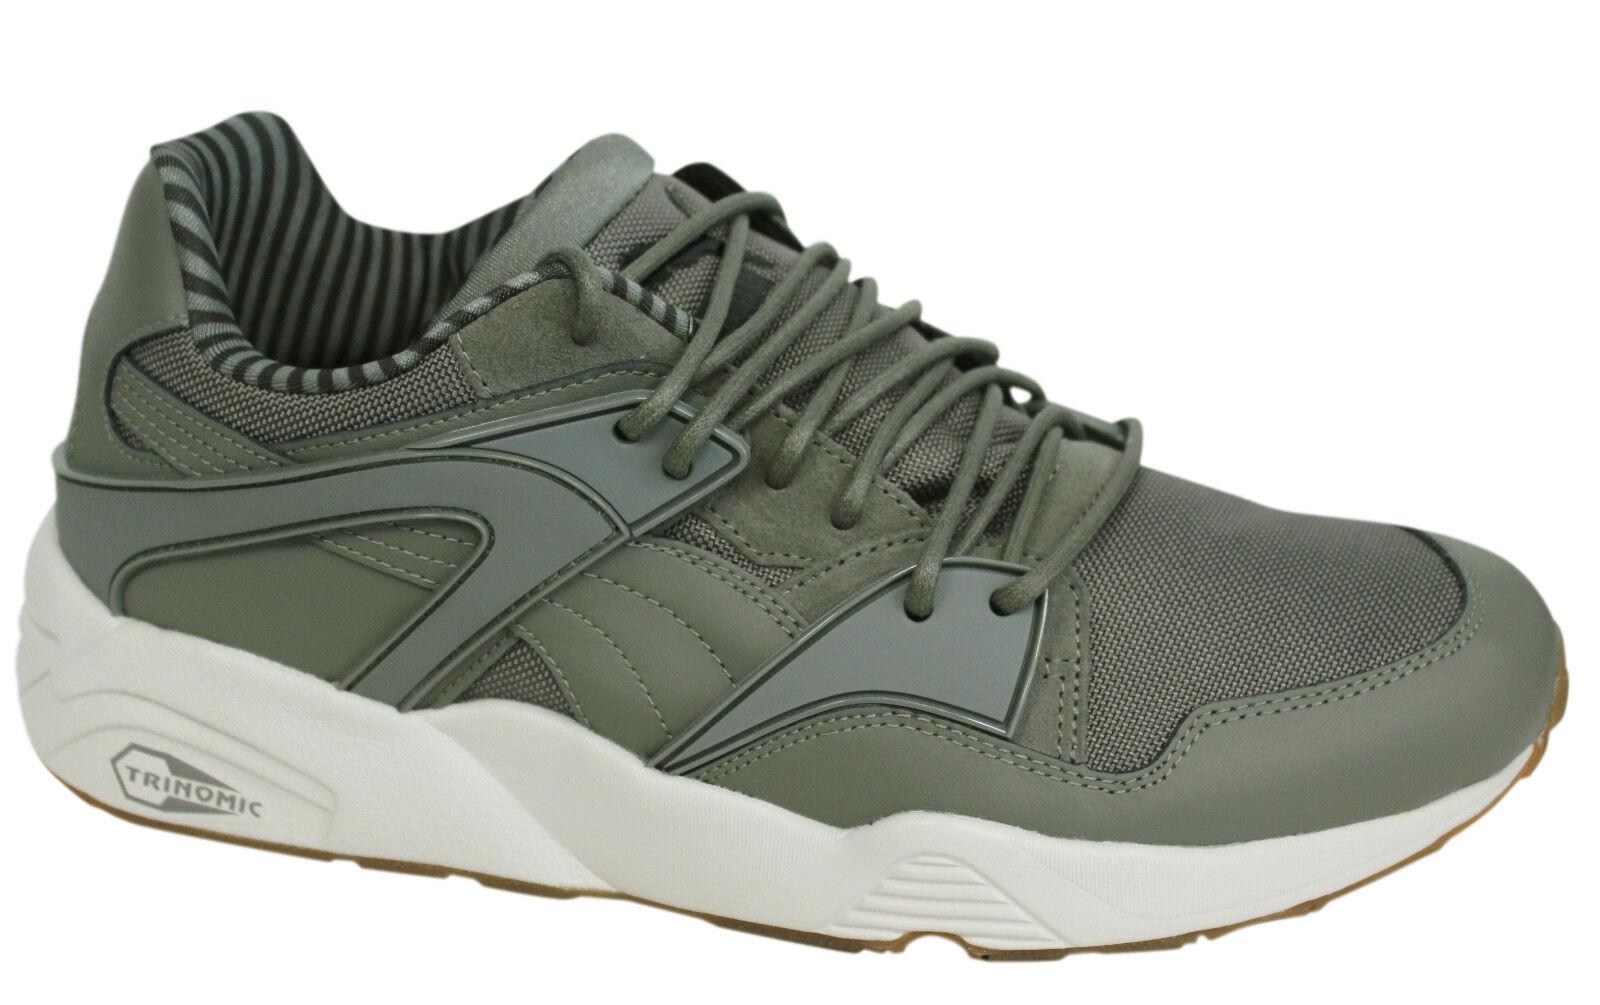 Puma Trinomic Blaze Citi Series Con Cordones Para hombre Zapatillas gris 359993 02 D126